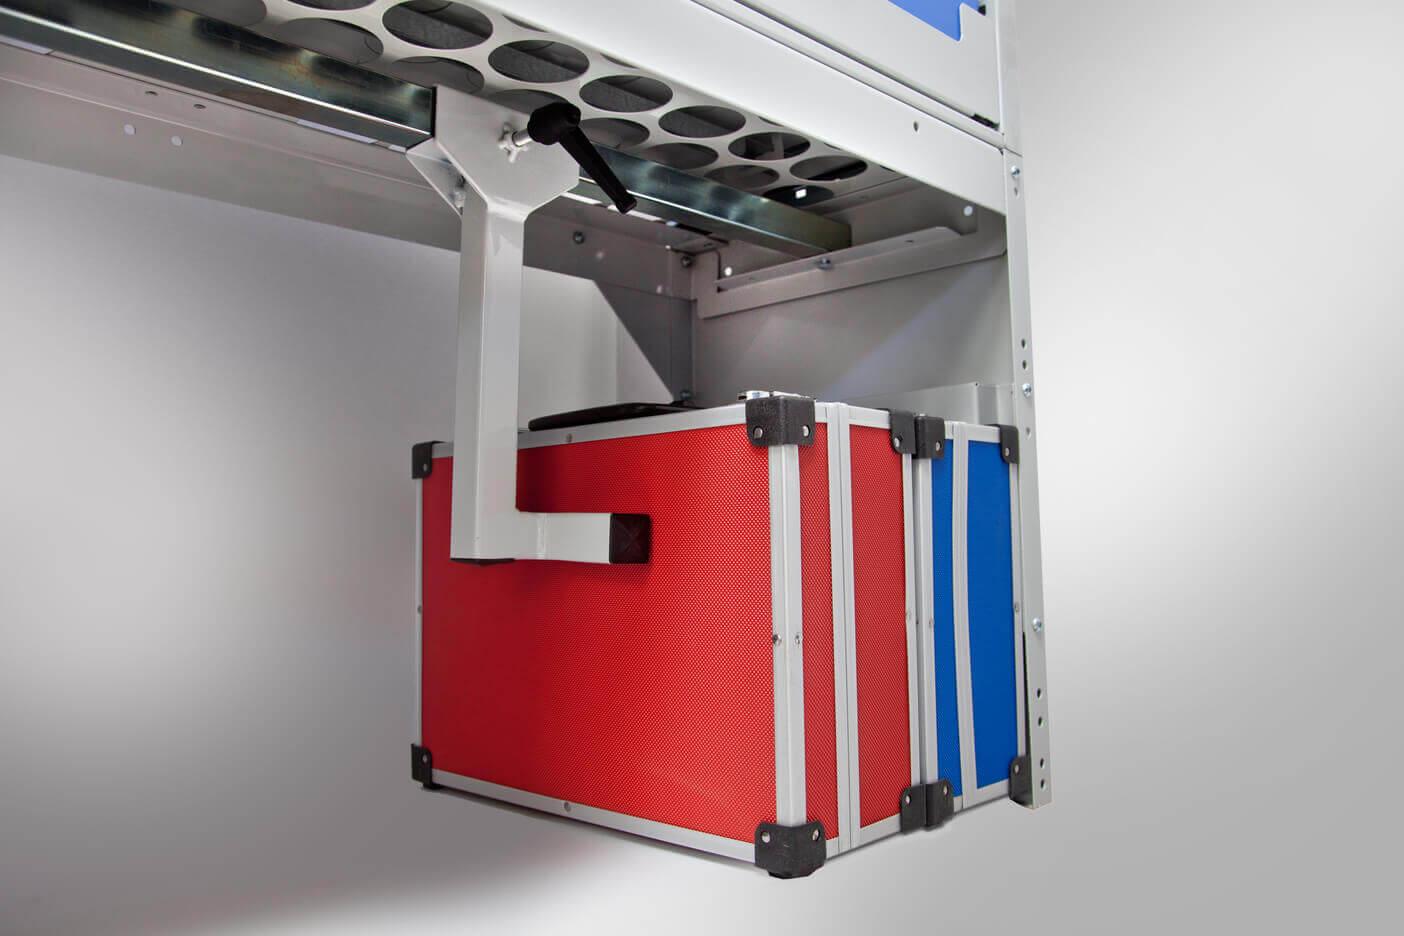 kit ferma valigette per scaffale furgone